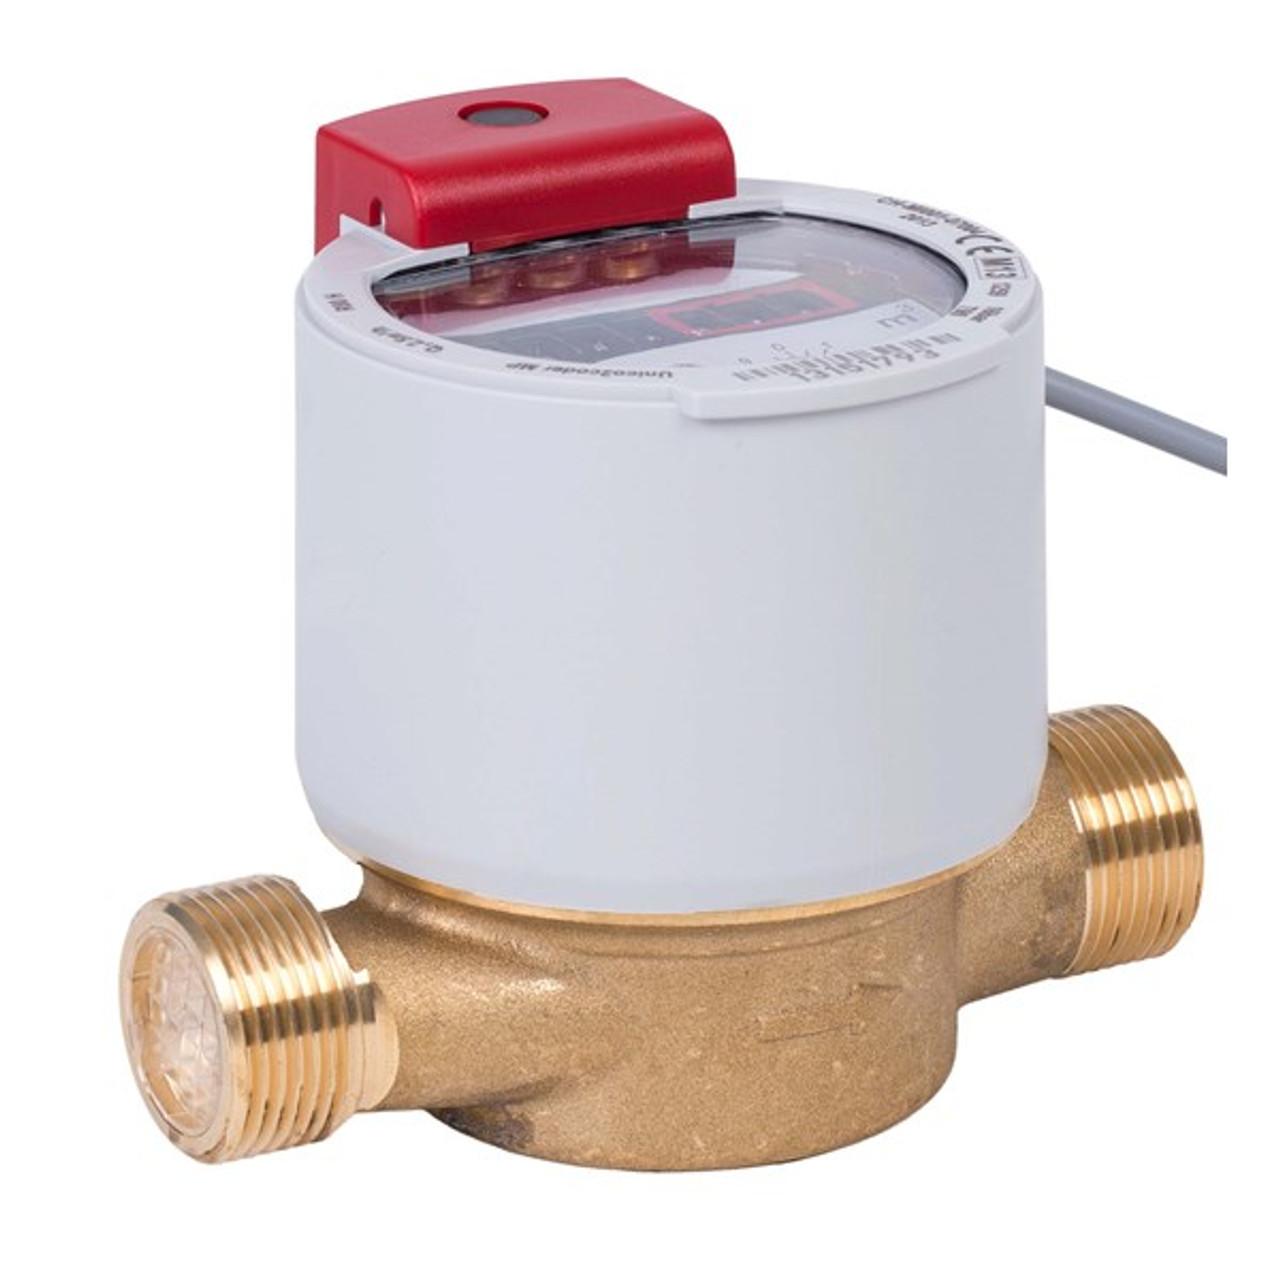 GWF UNICOcoder Warm water meter MP Q3 2.5, G3/4B, DN15, L-110 mm, M-Bus